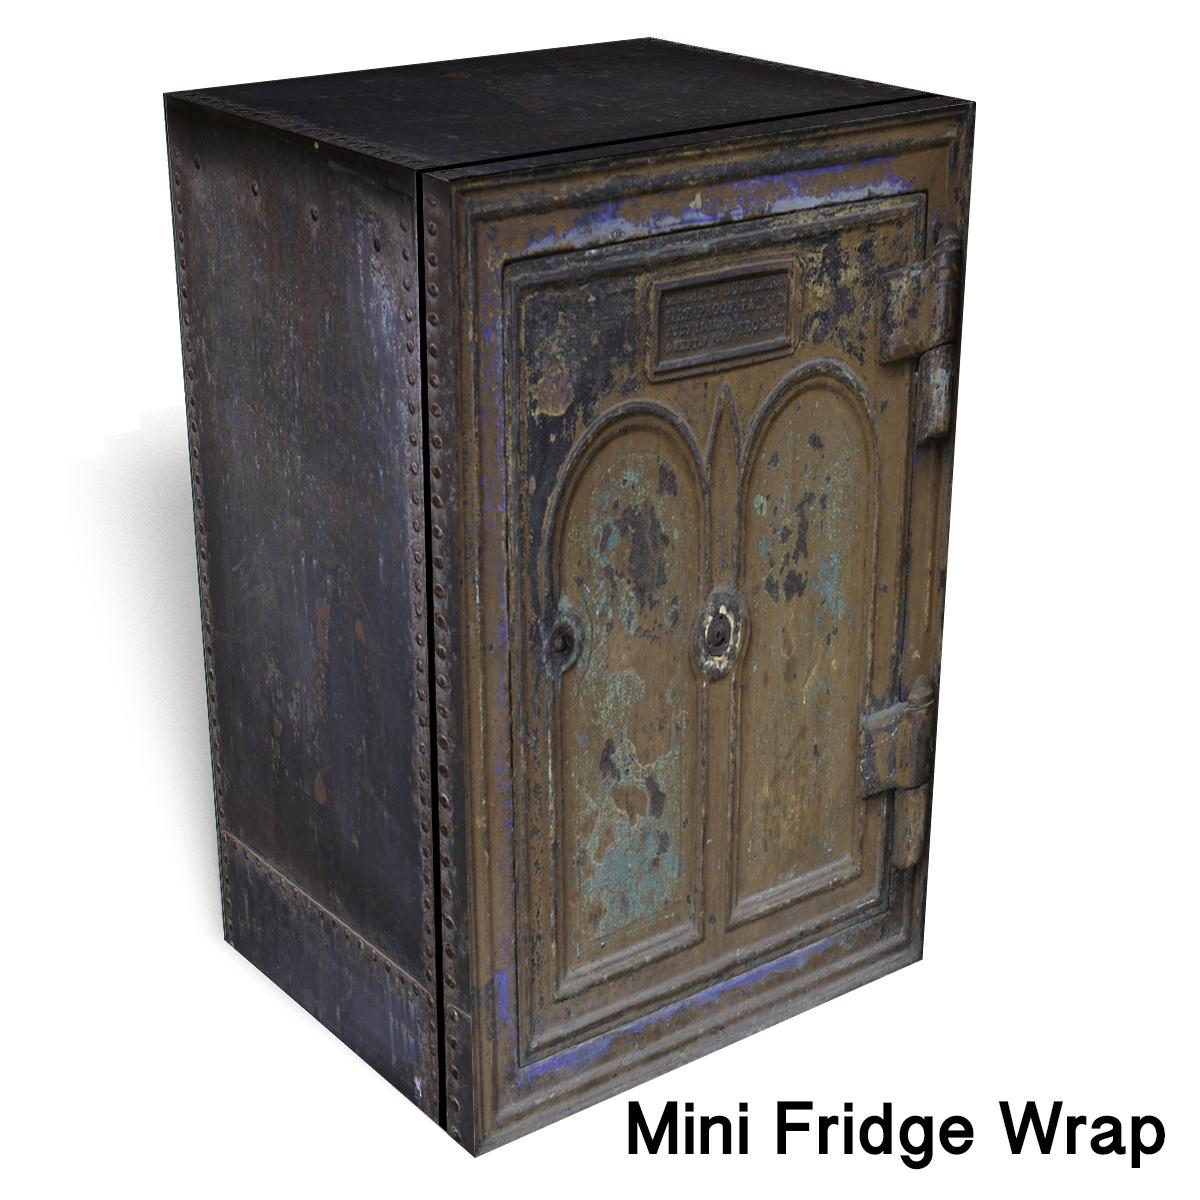 IC 2 Vintage Safe Mini Fridge Wrap